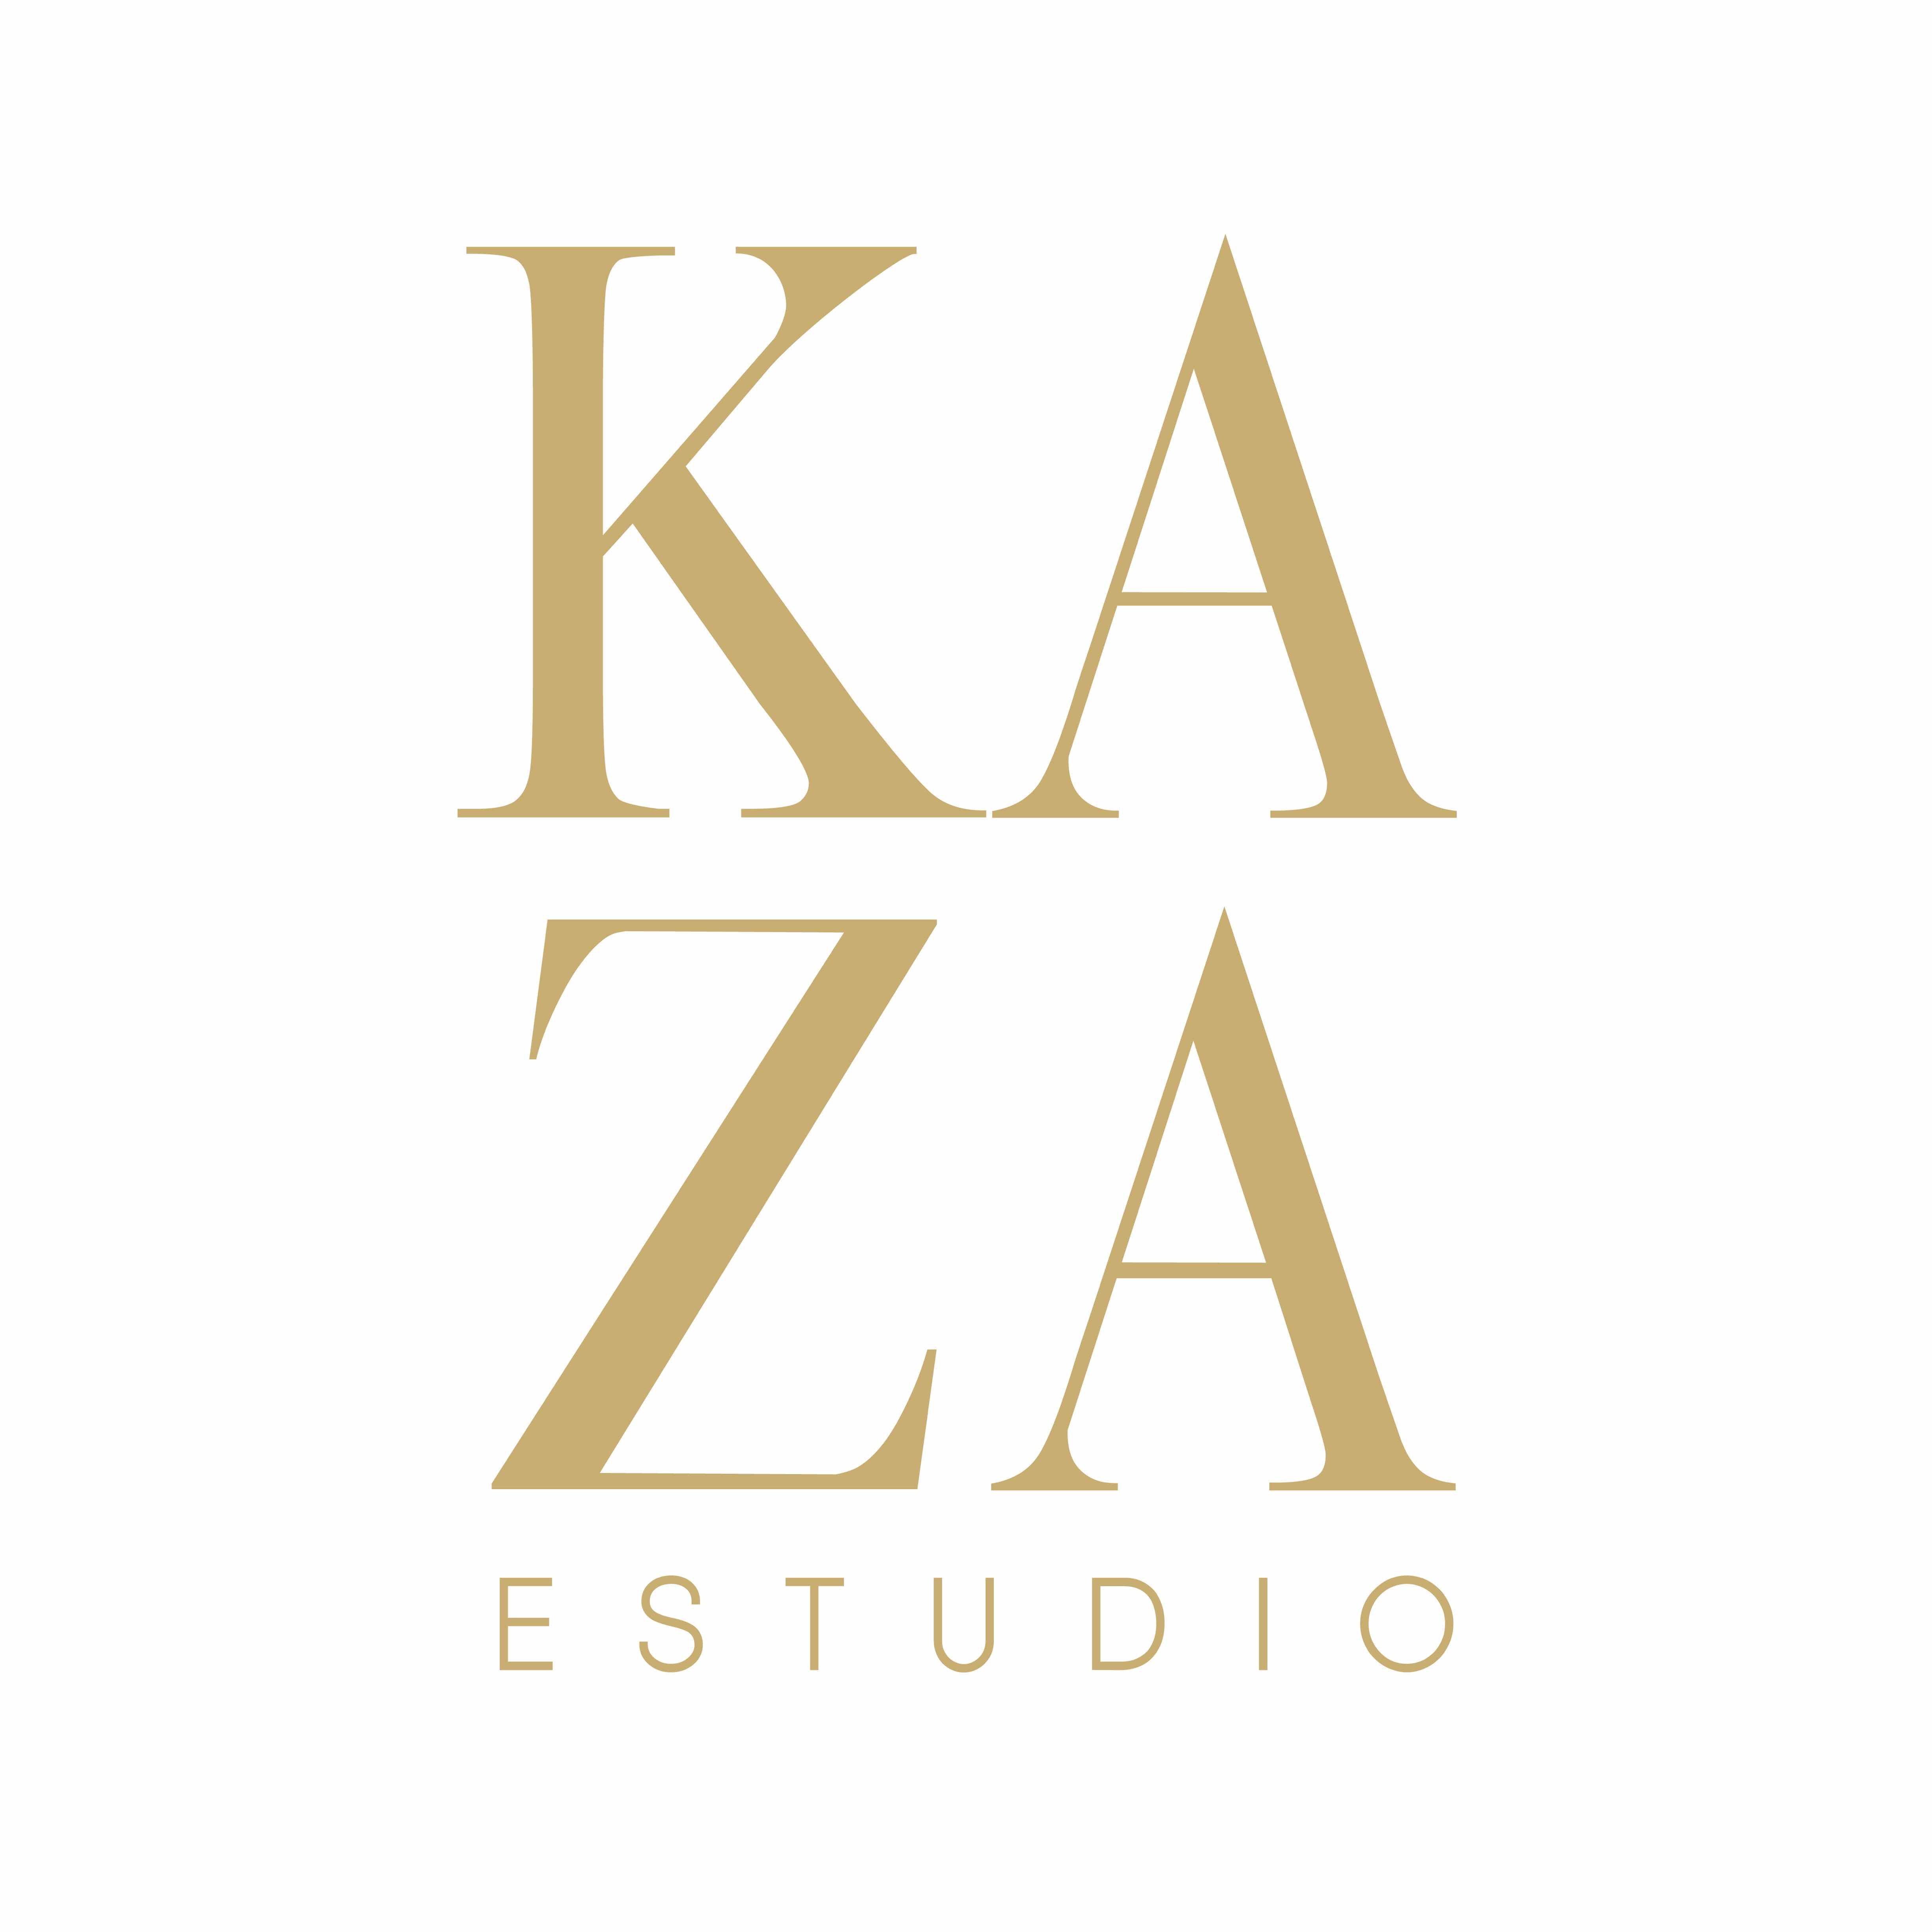 KaZa Estudio